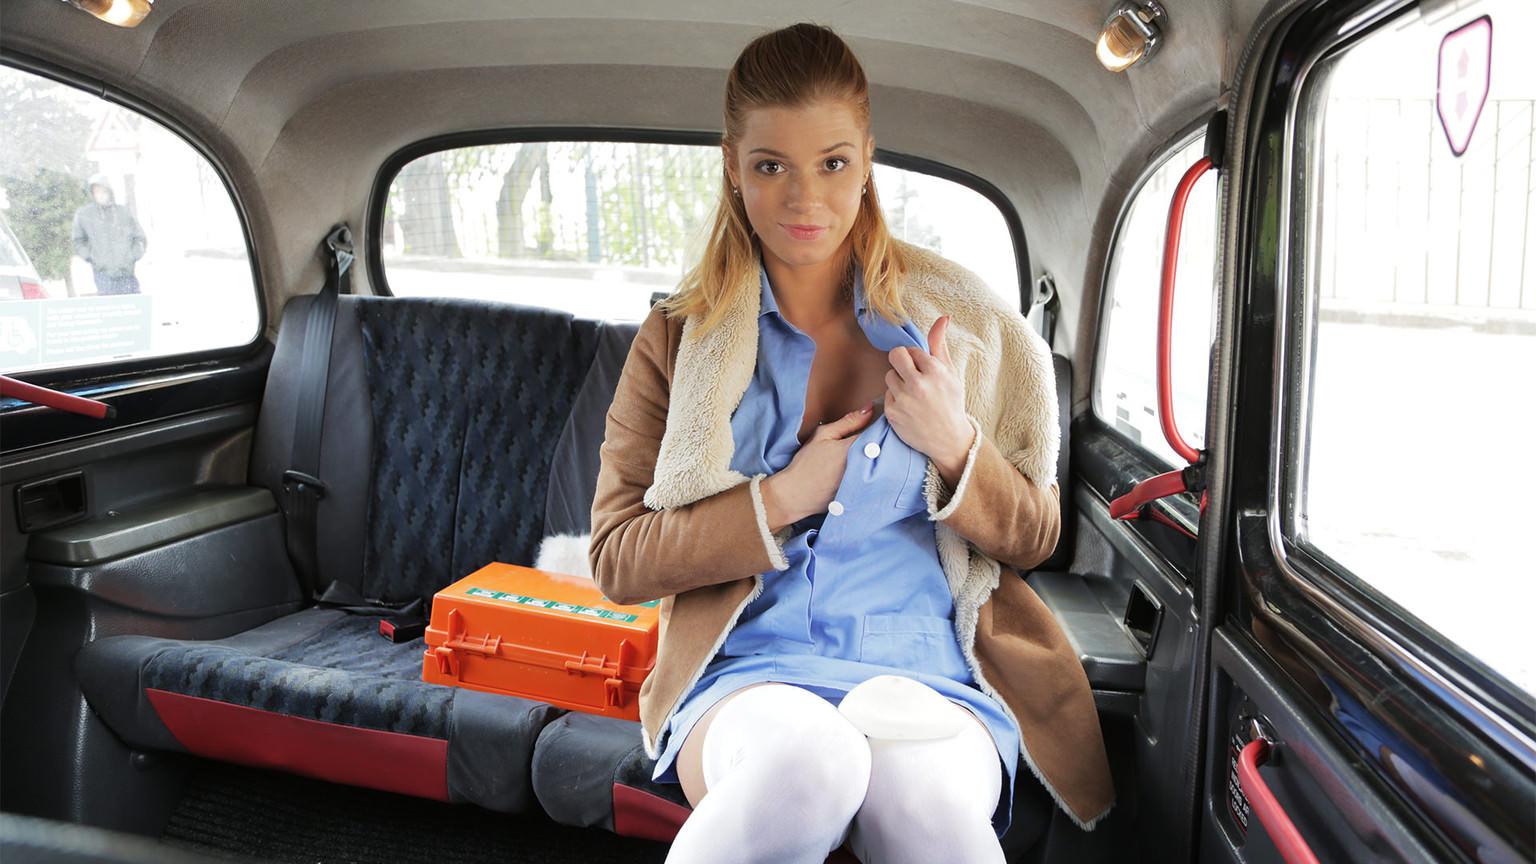 Nurse in Sexy Lingerie has Car Sex - Fake Taxi